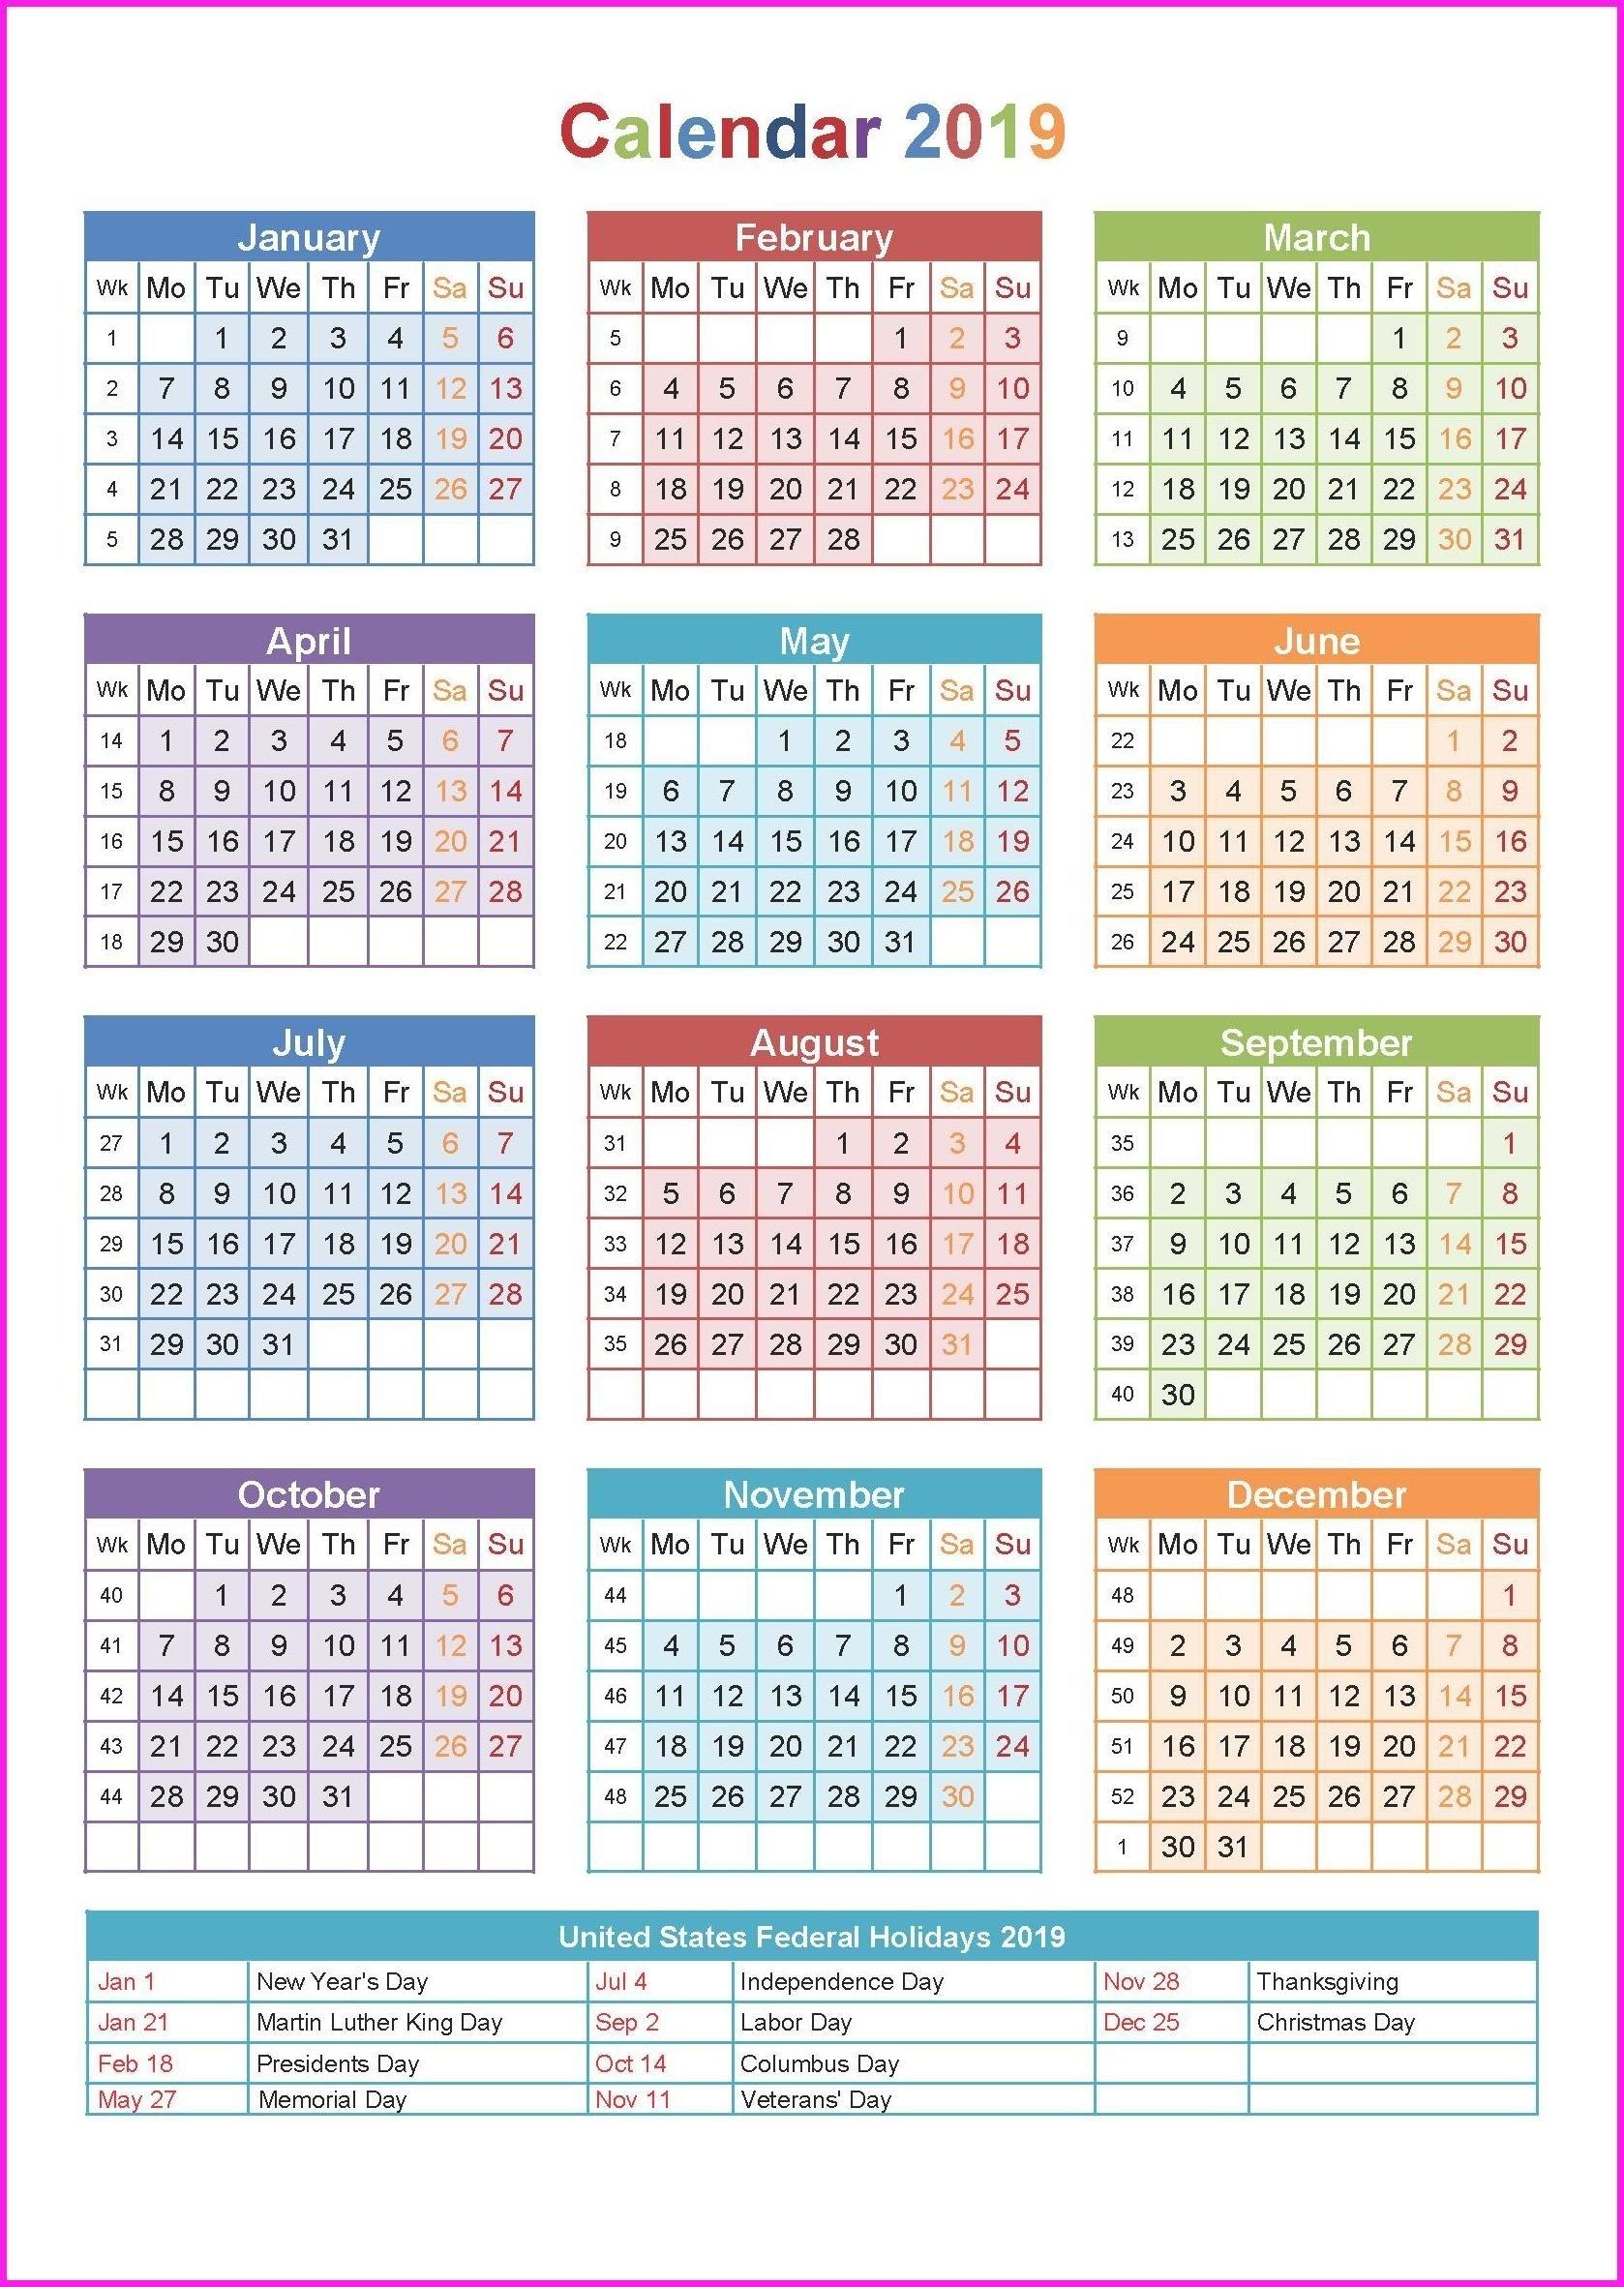 2019 Holiday Calendar Usa #calendar2019 #printablecalendar with regard to 1 Week Vacation Calendar Printable